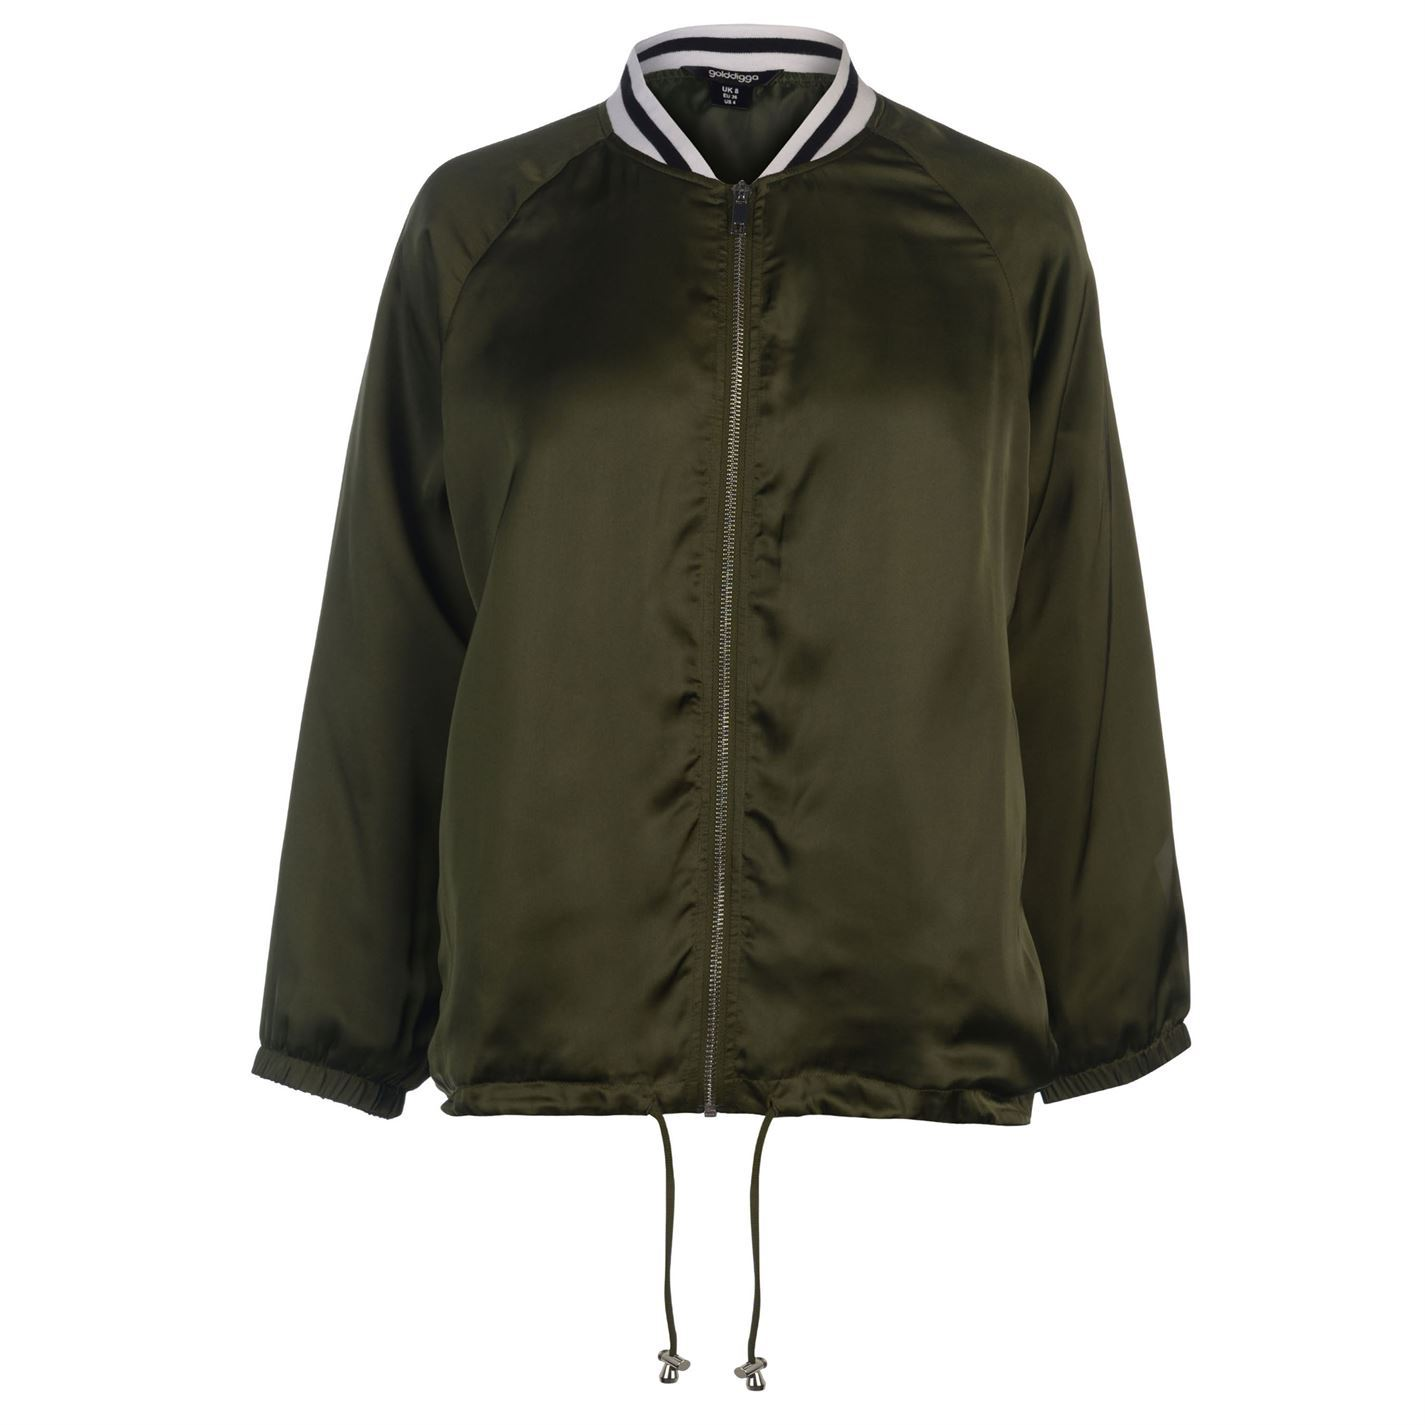 Golddigga-Bomber-Jacket-Womens-Coats-Outerwear thumbnail 3